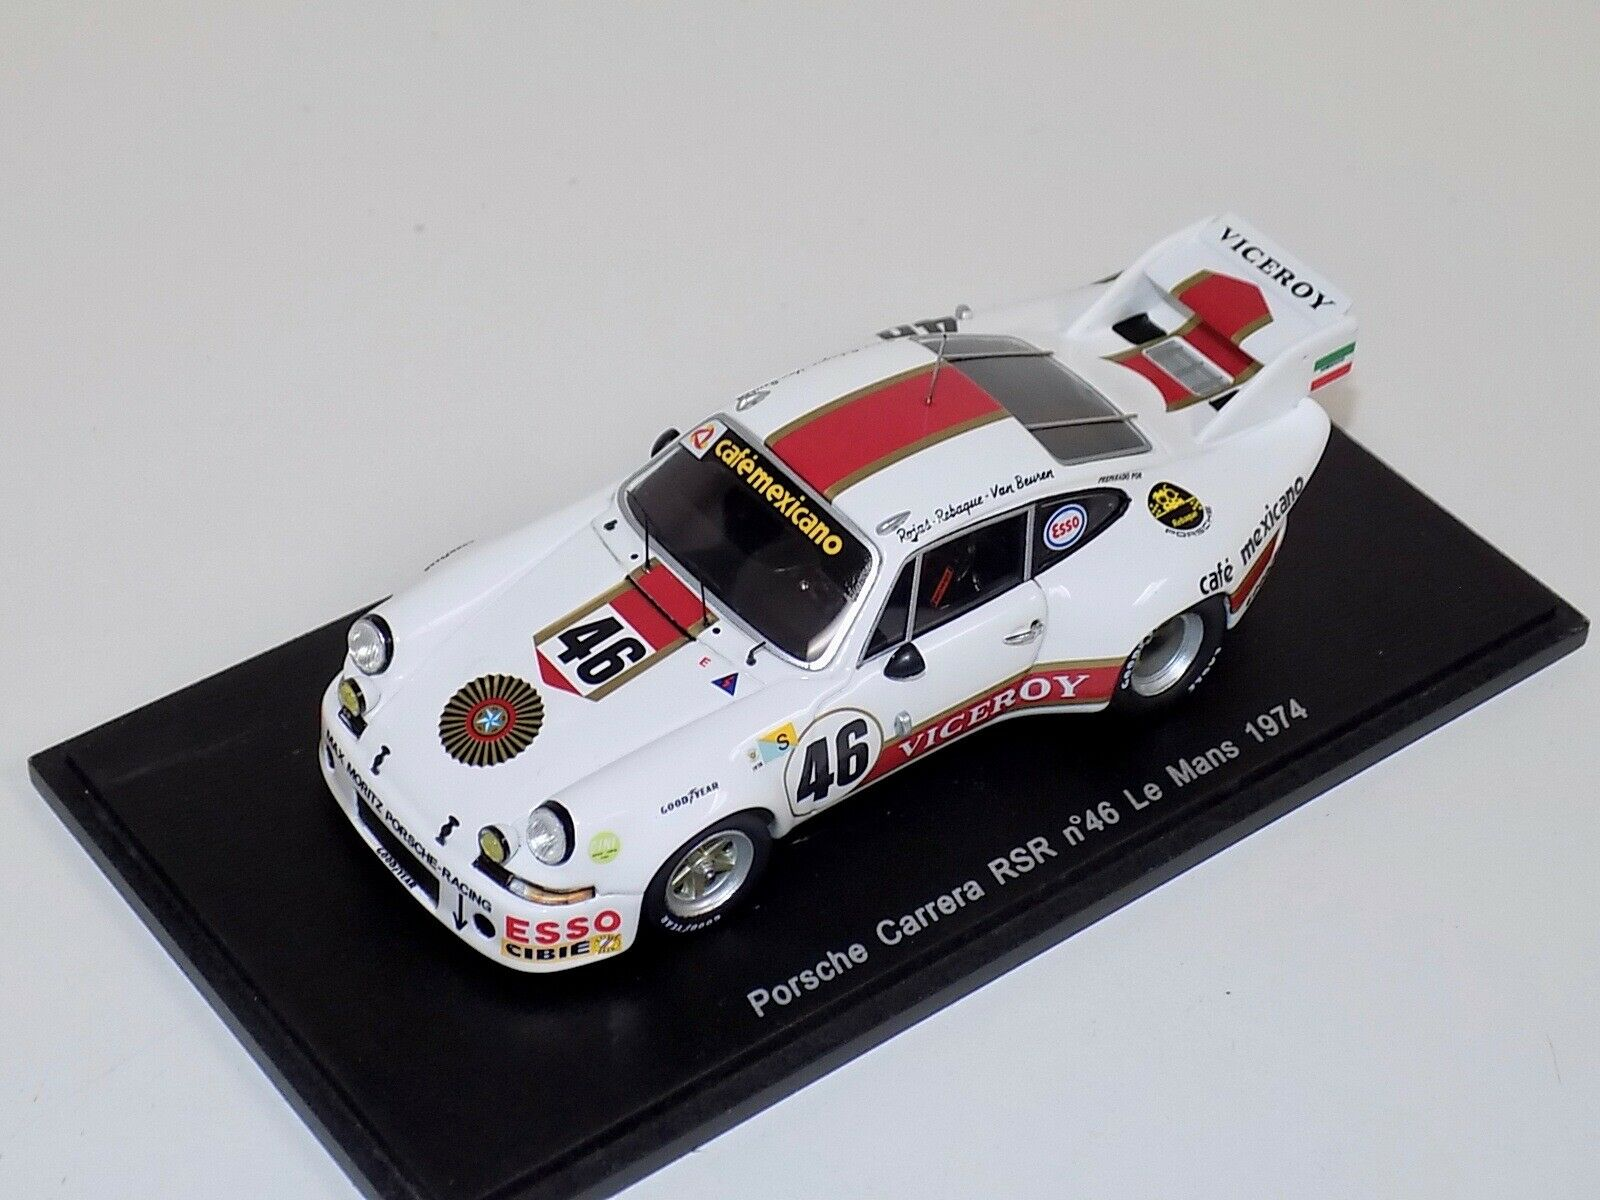 1 43 Spark Porsche 911 RSR Carrera Car  Viceroy  1974 24 H LeMans  S3399